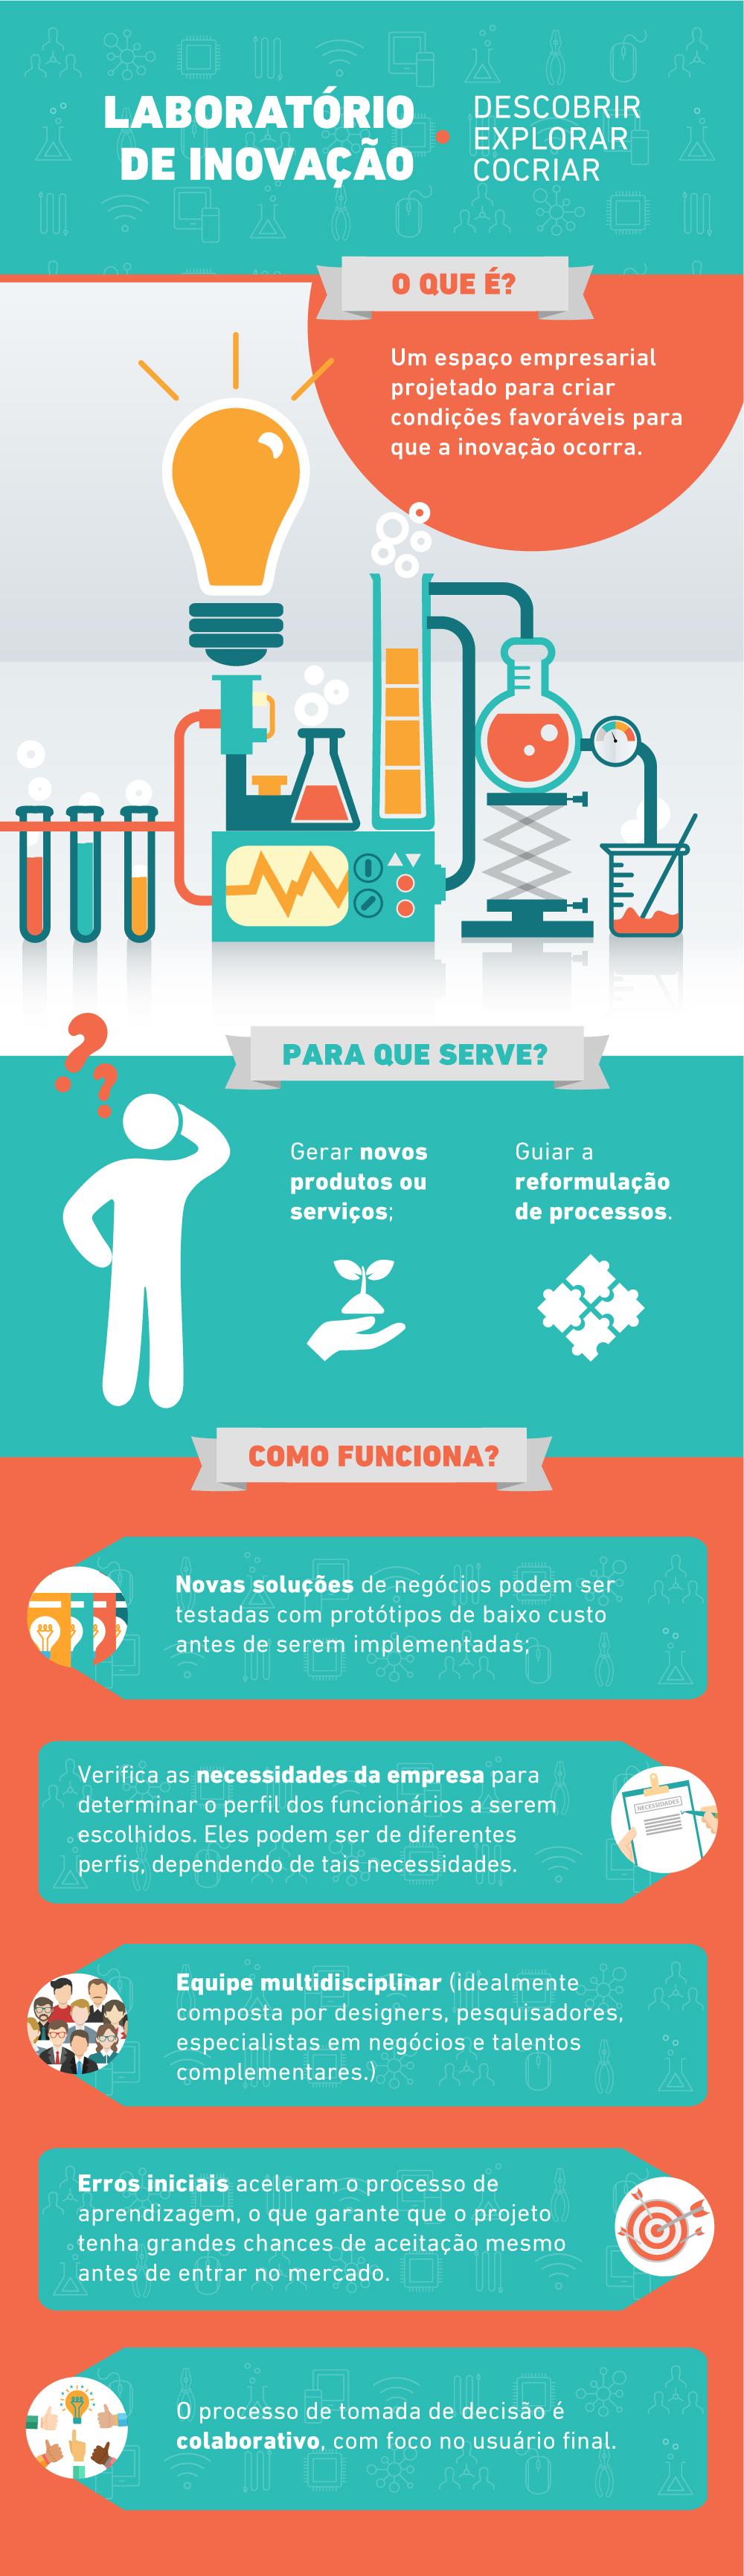 laboratorio_de_inovacao_infografico